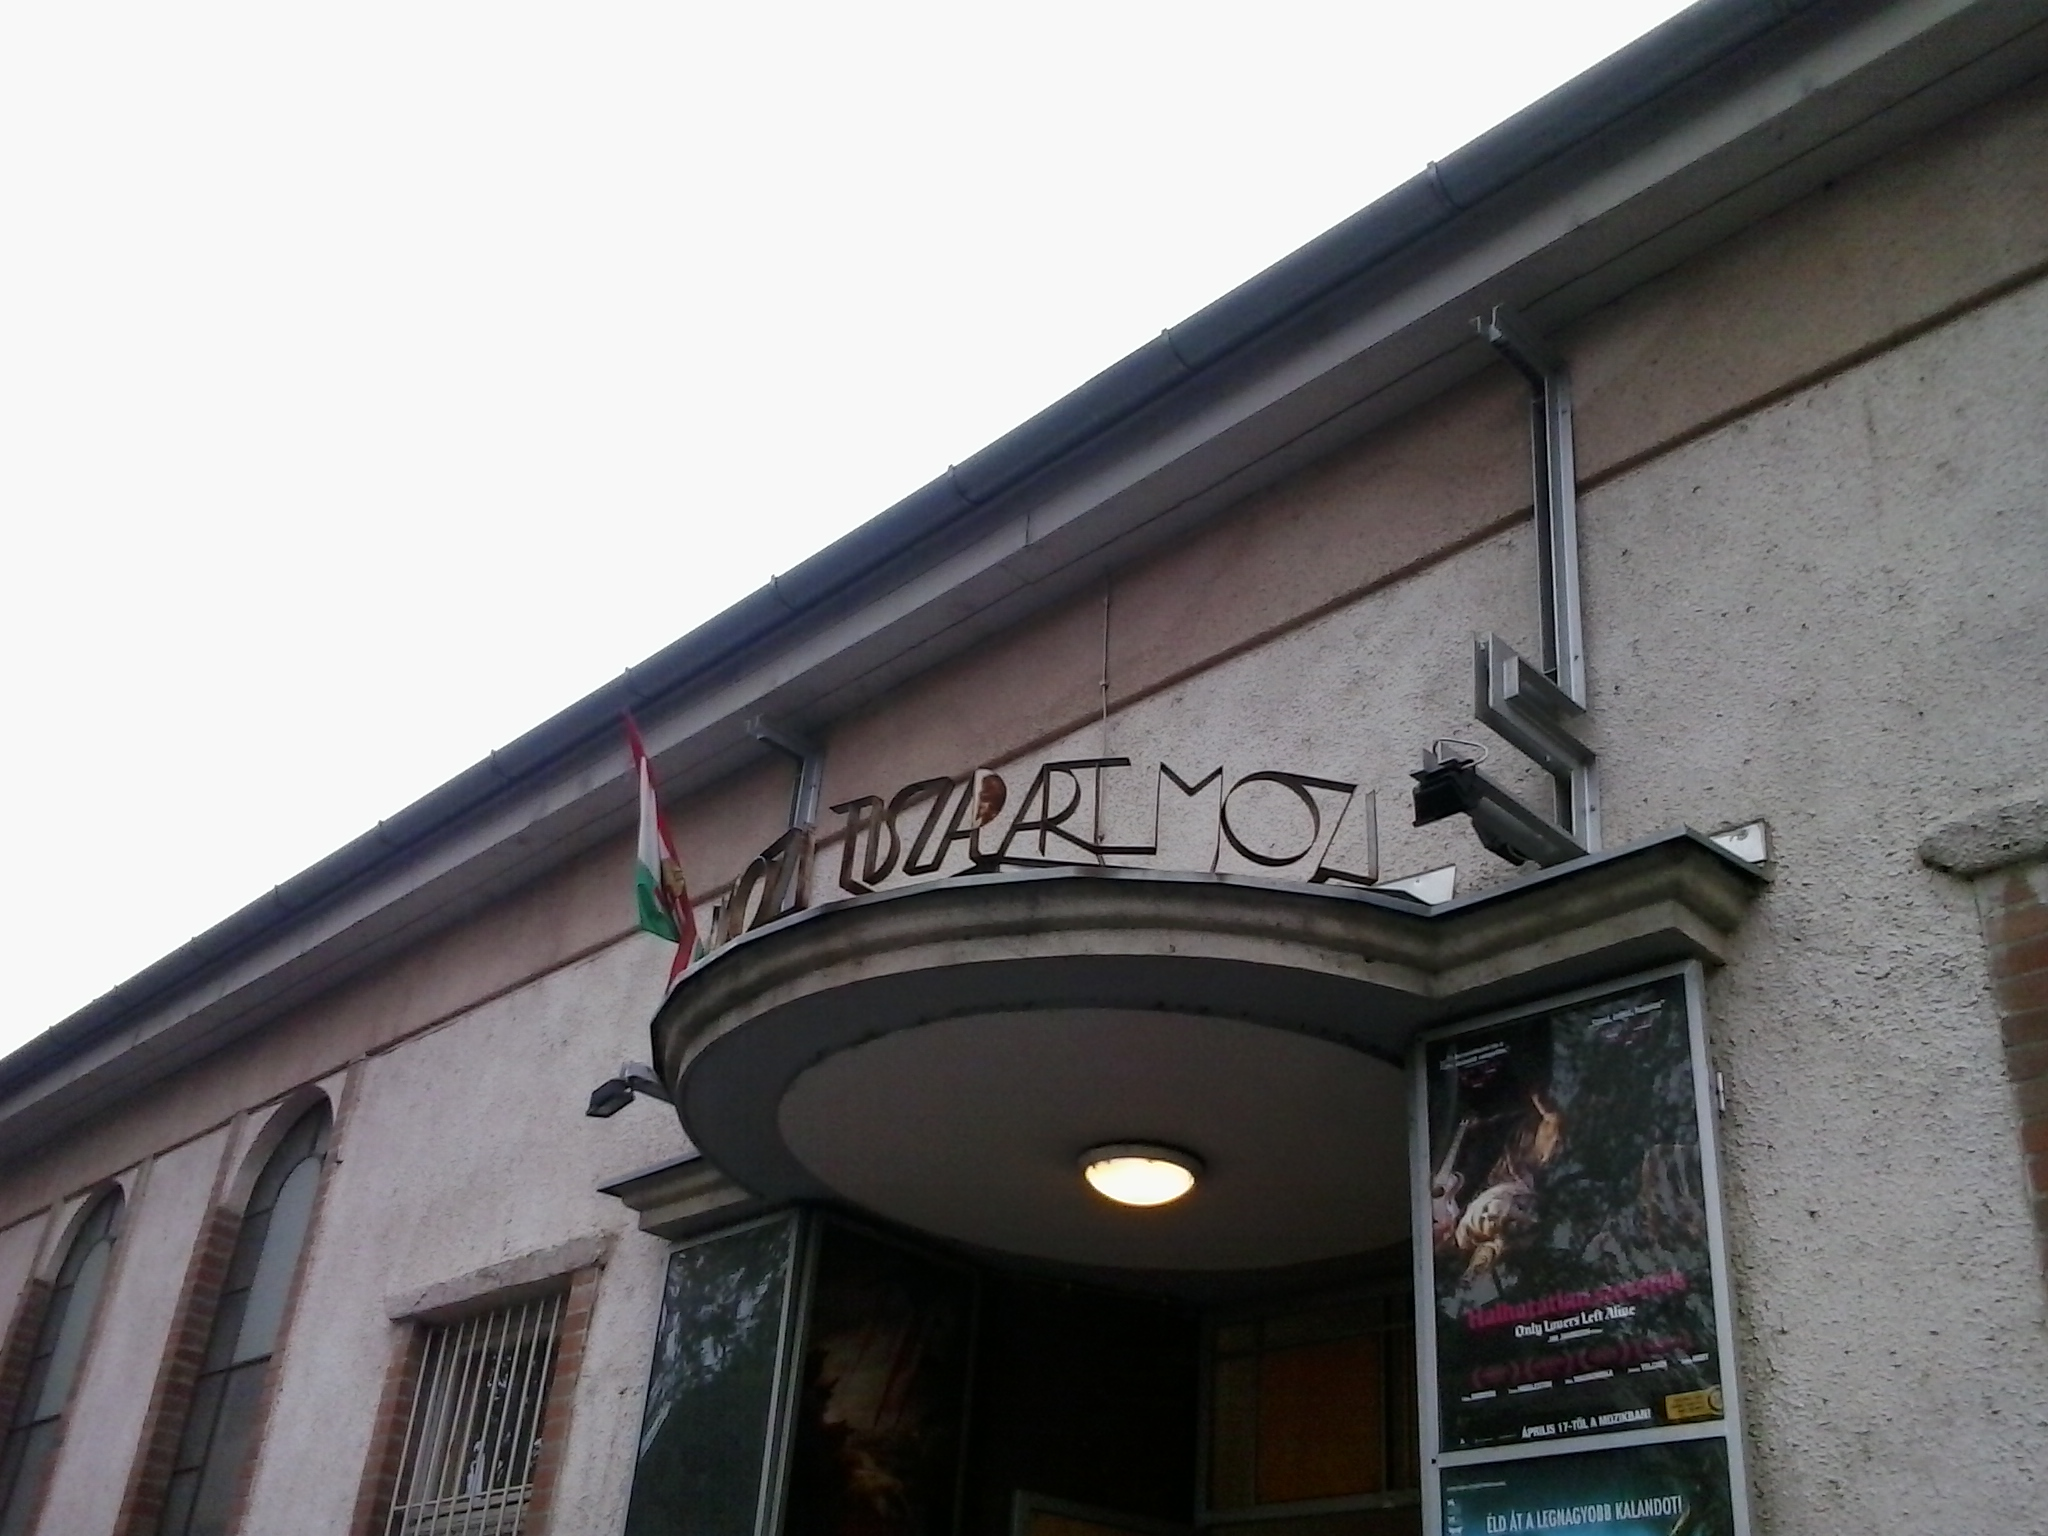 TISZApART mozi, Szolnok